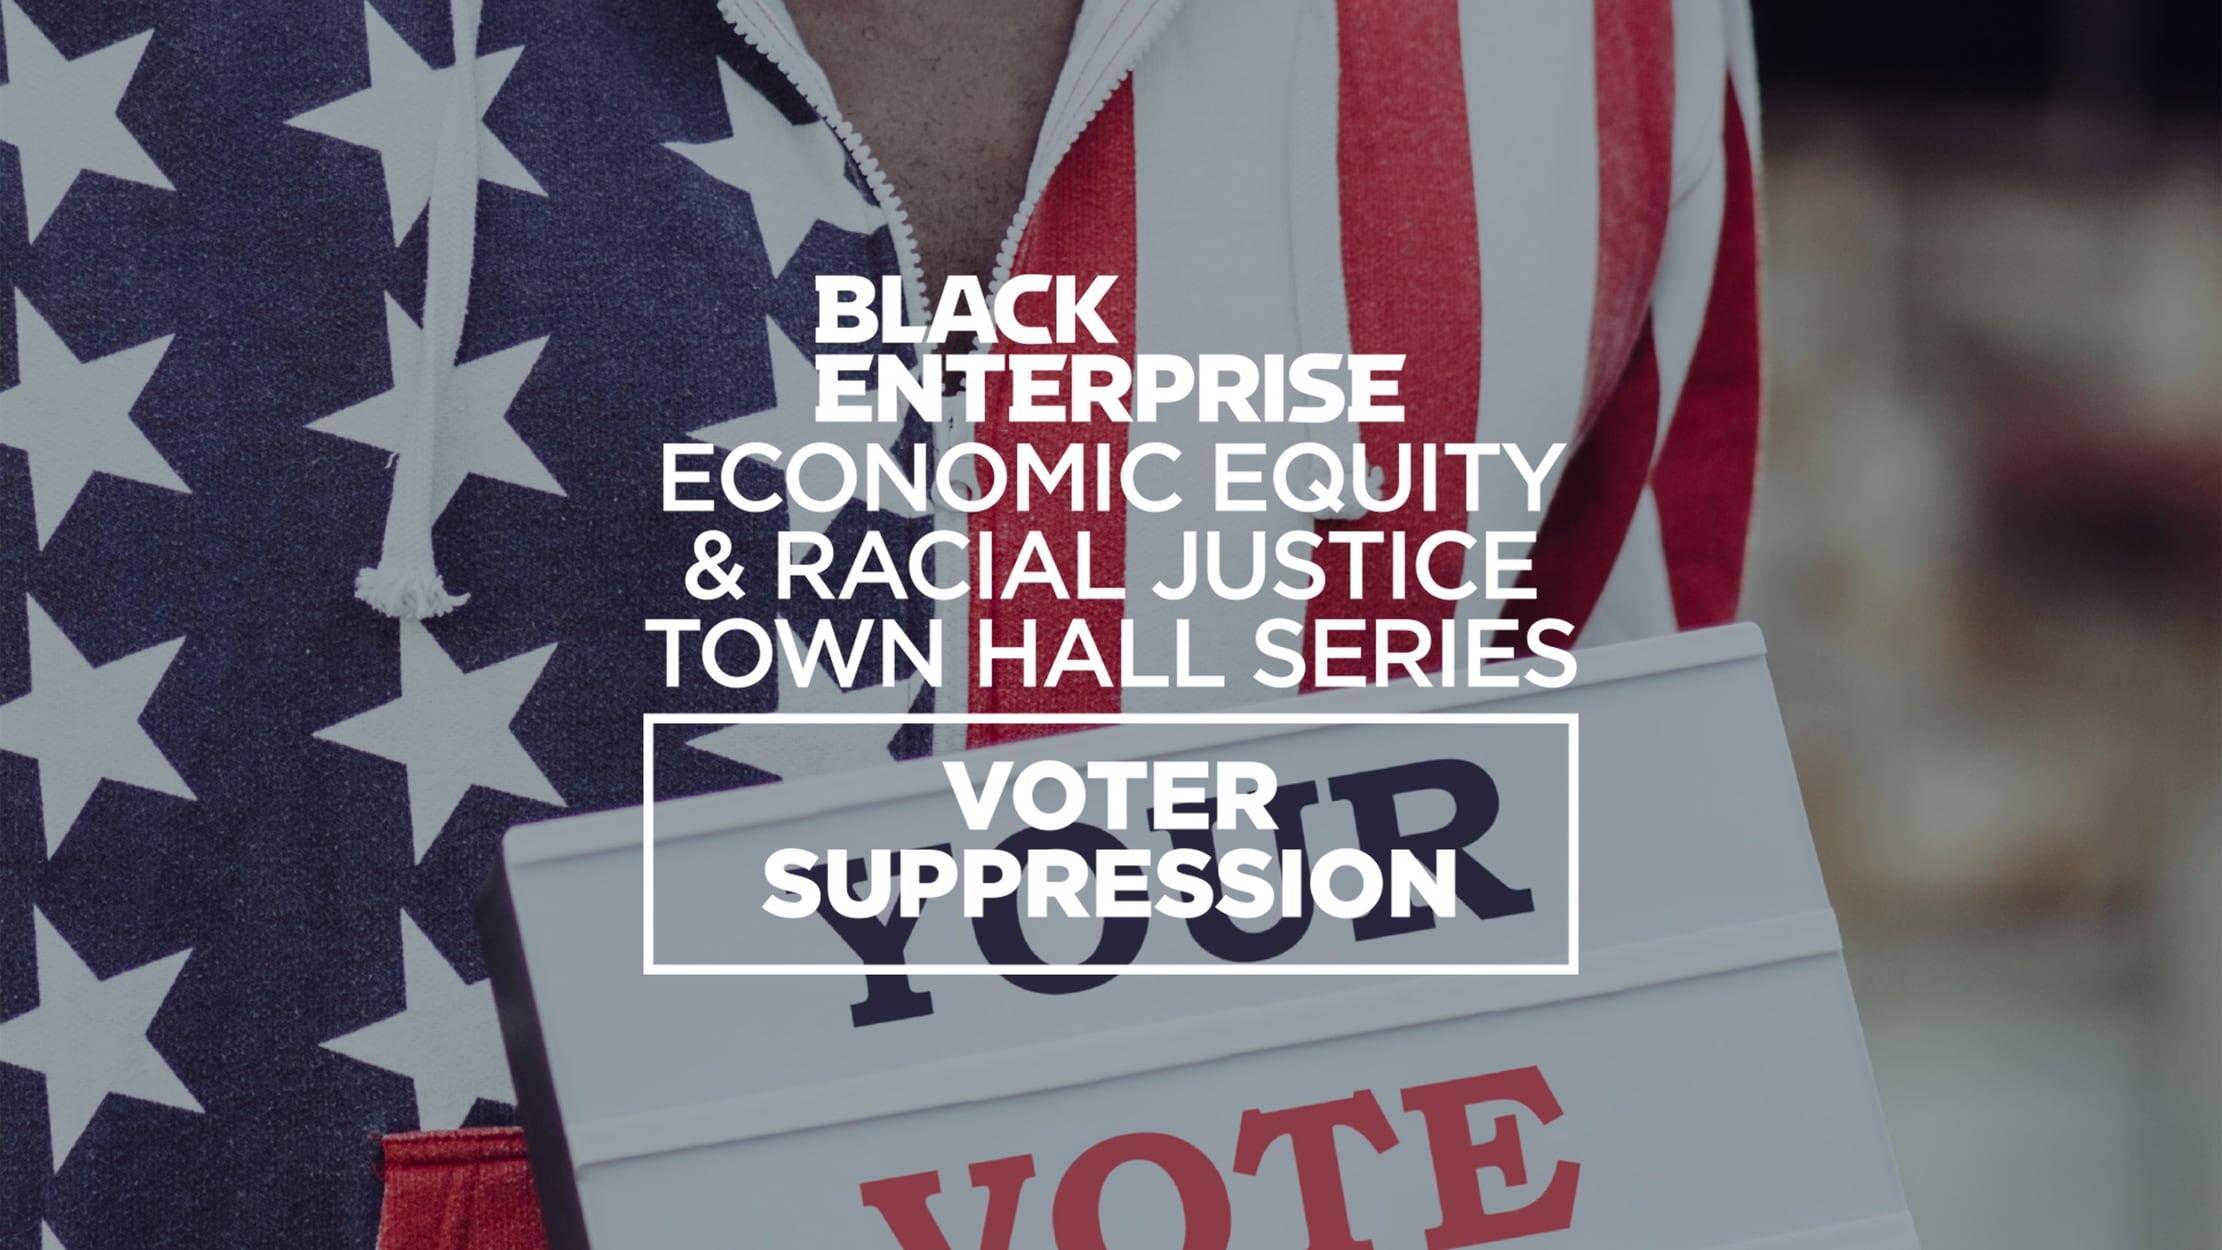 Voter Suppression Town Hall seriesDetail